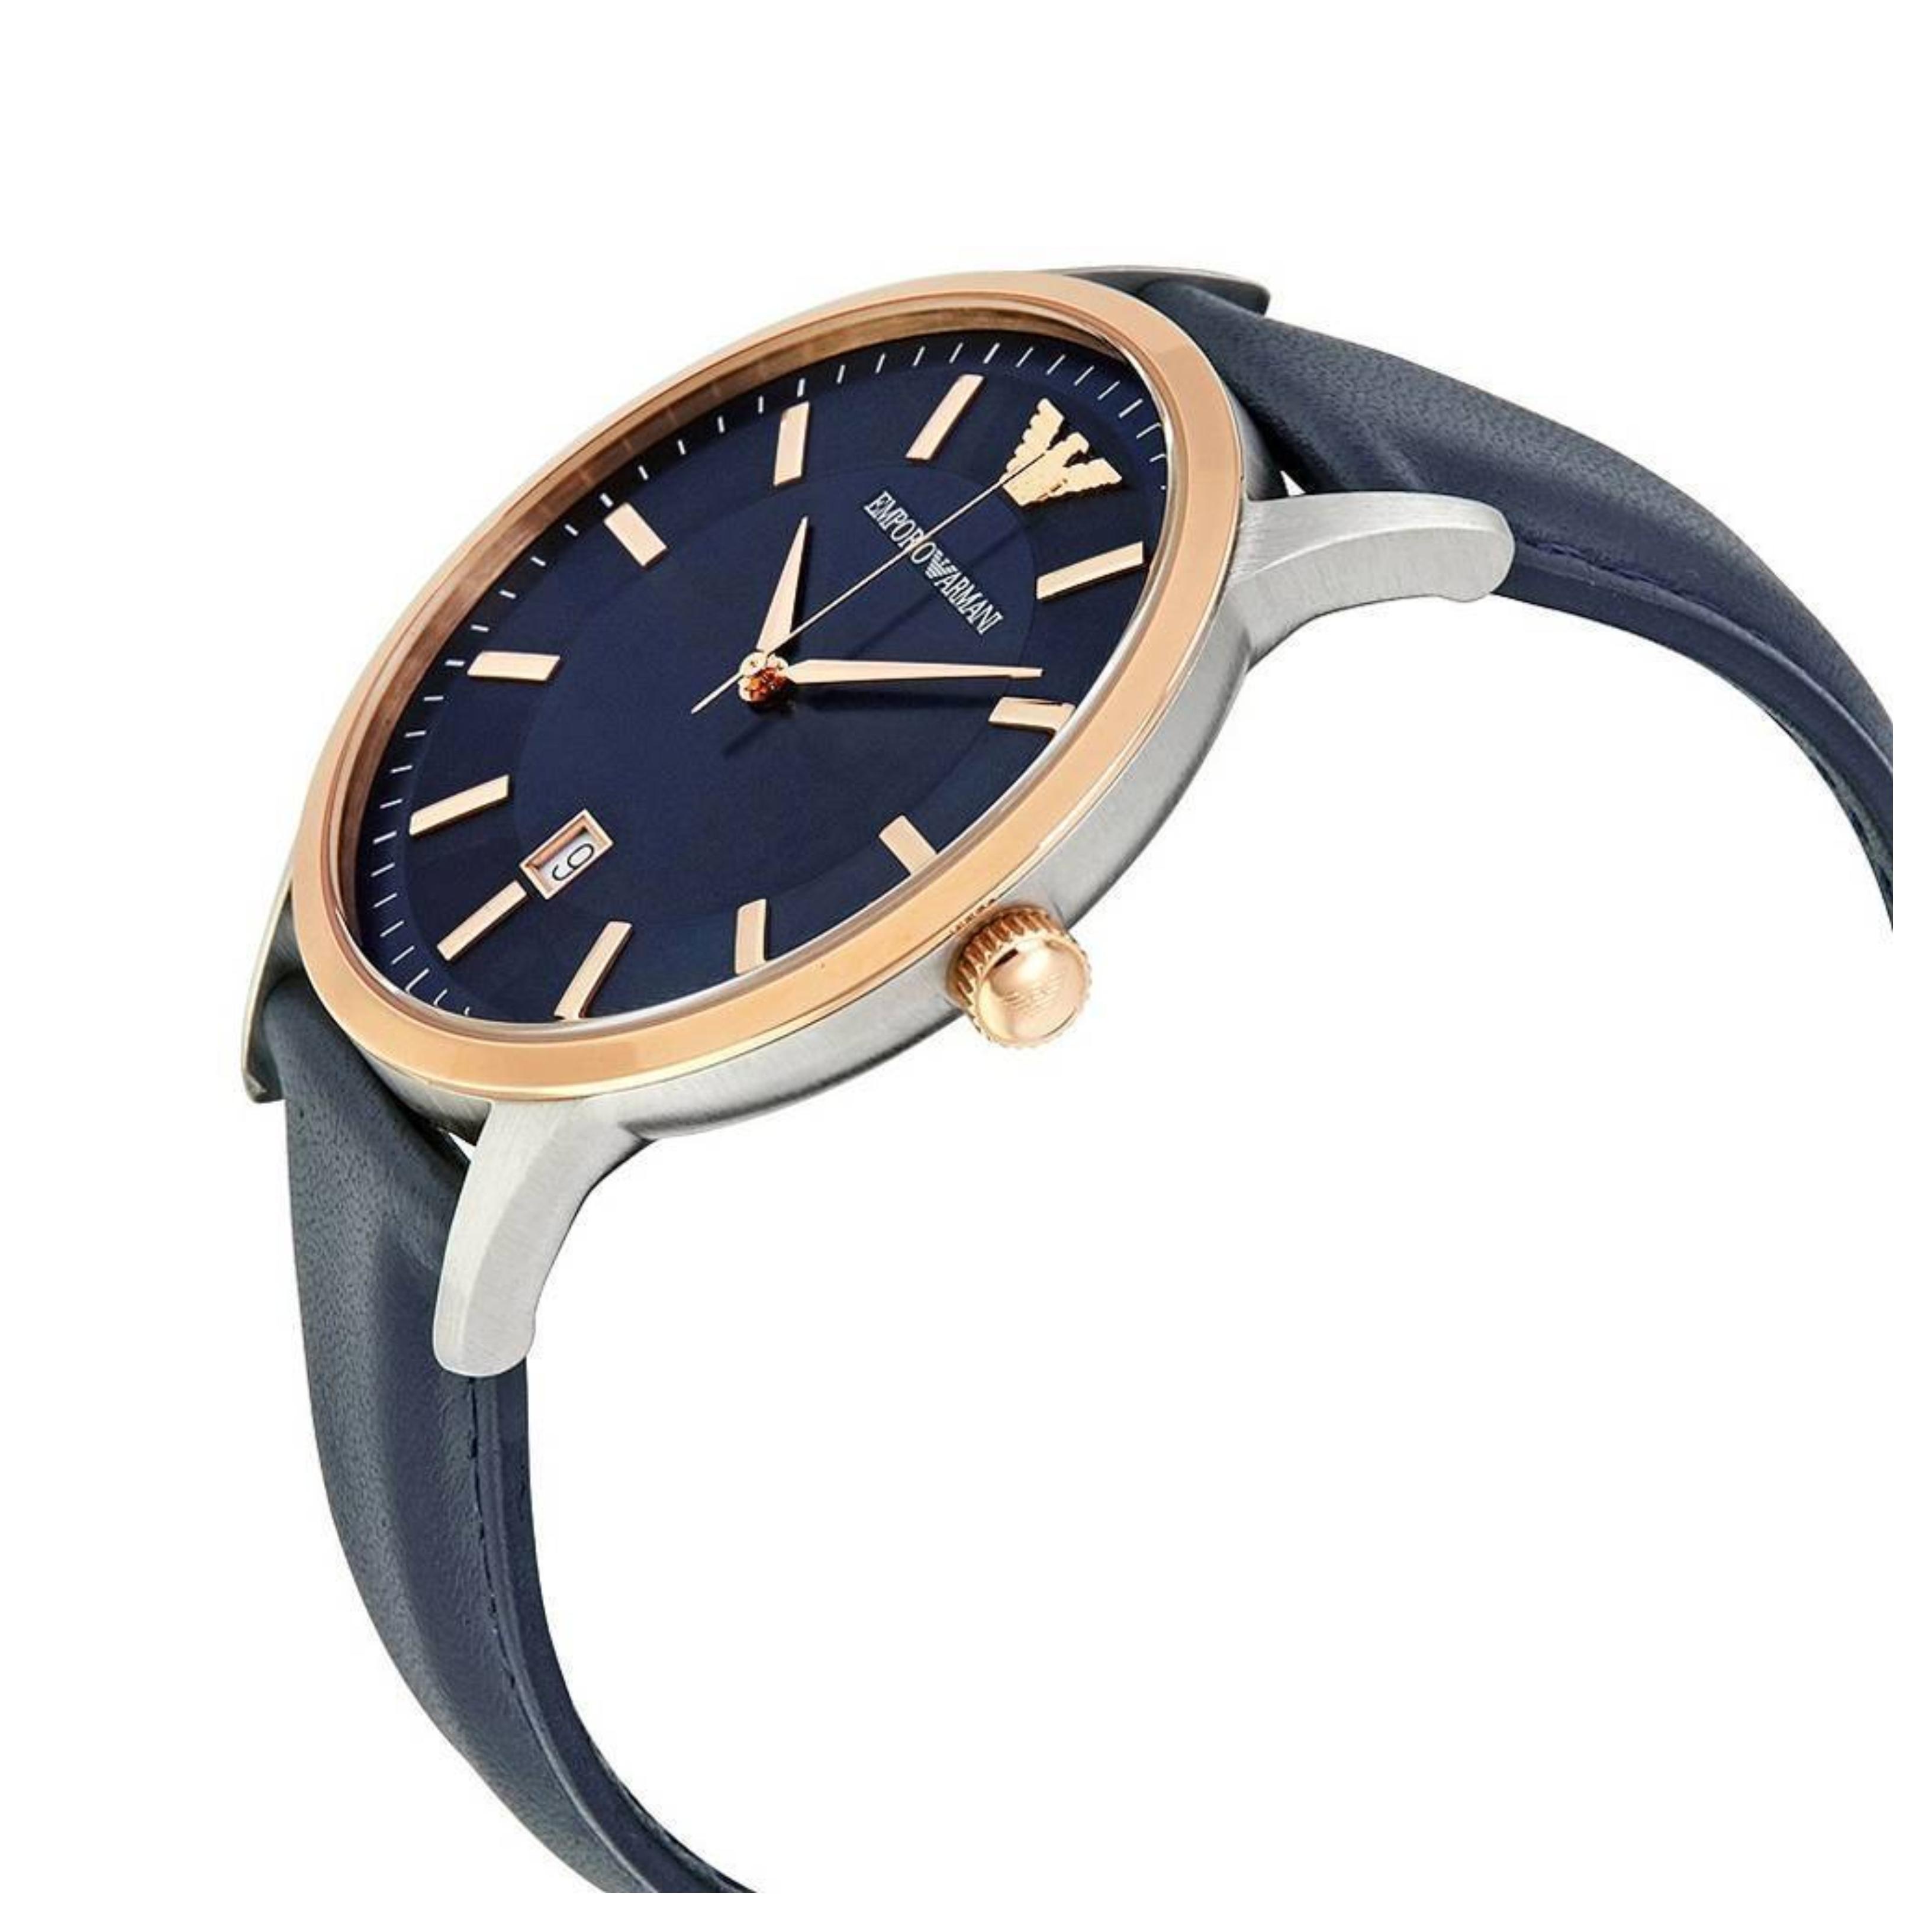 Sentinel Emporio Armani Renato Men s Watch│Navy Blue Sunray Dial│Leather  Strap│AR2506 2f4ef0a132